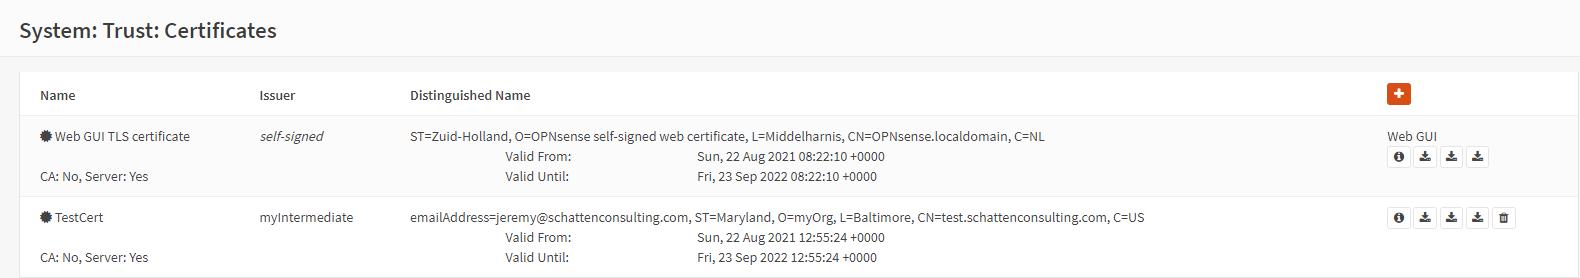 OPNSense Sign Certificate Request